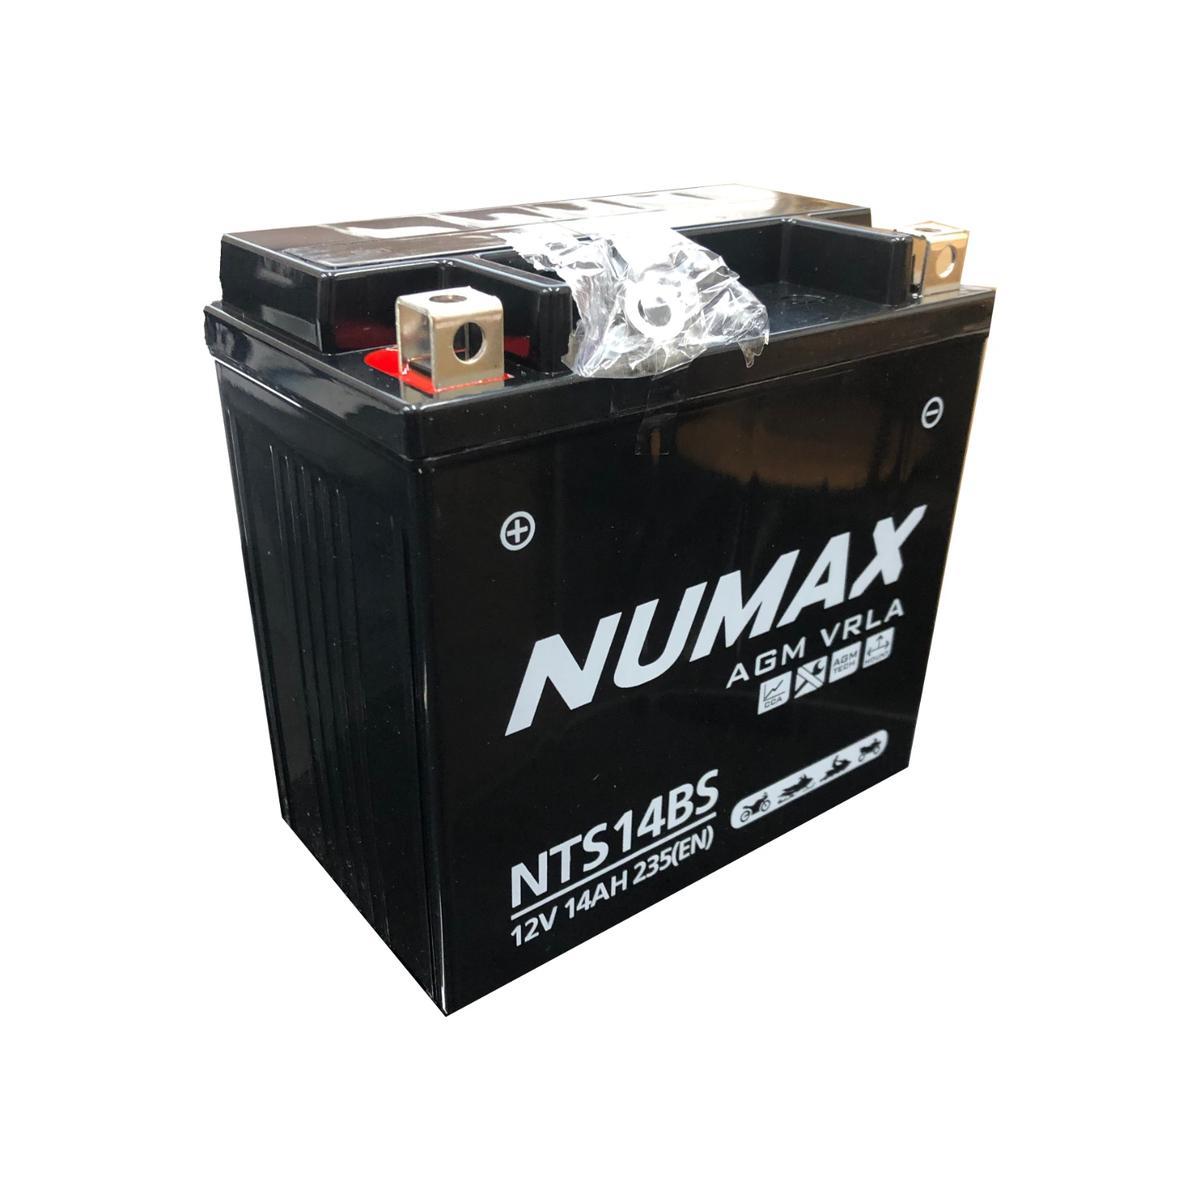 Numax NTS14BS 12v Motorbike Bike Battery HONDA 1000cc XL1000V YTX14-4